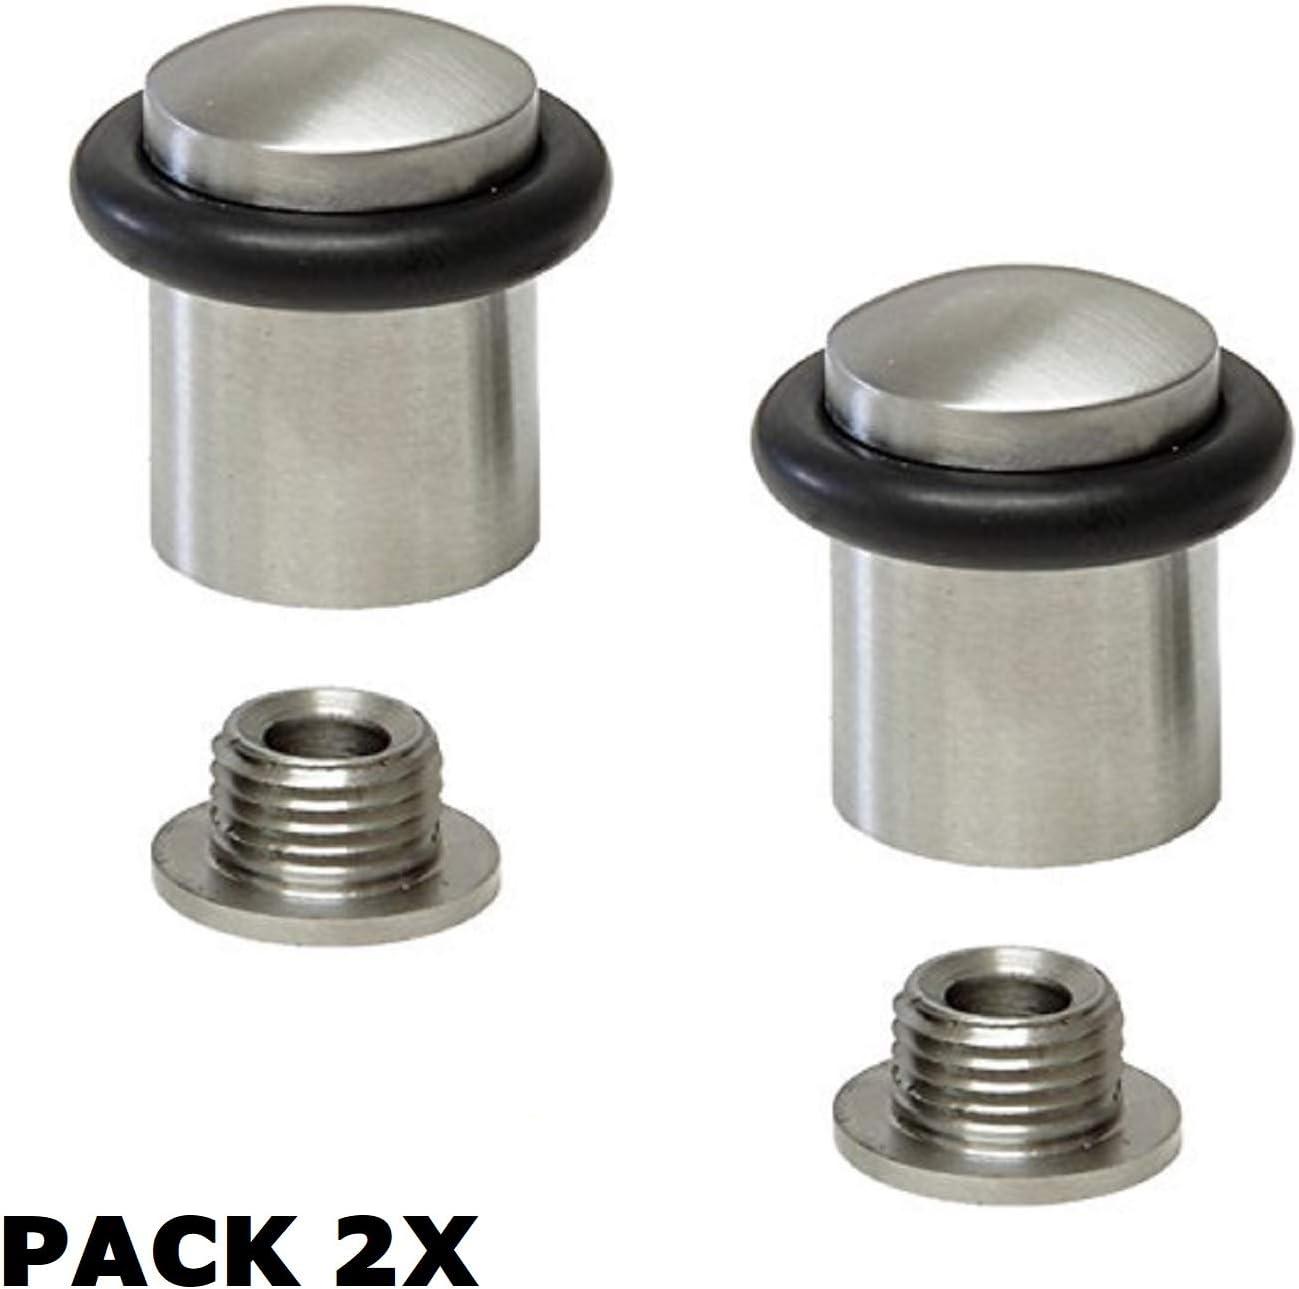 EVI Herrajes 040159CB2UAM Pack de 2 topes de puerta (acero inoxidable)